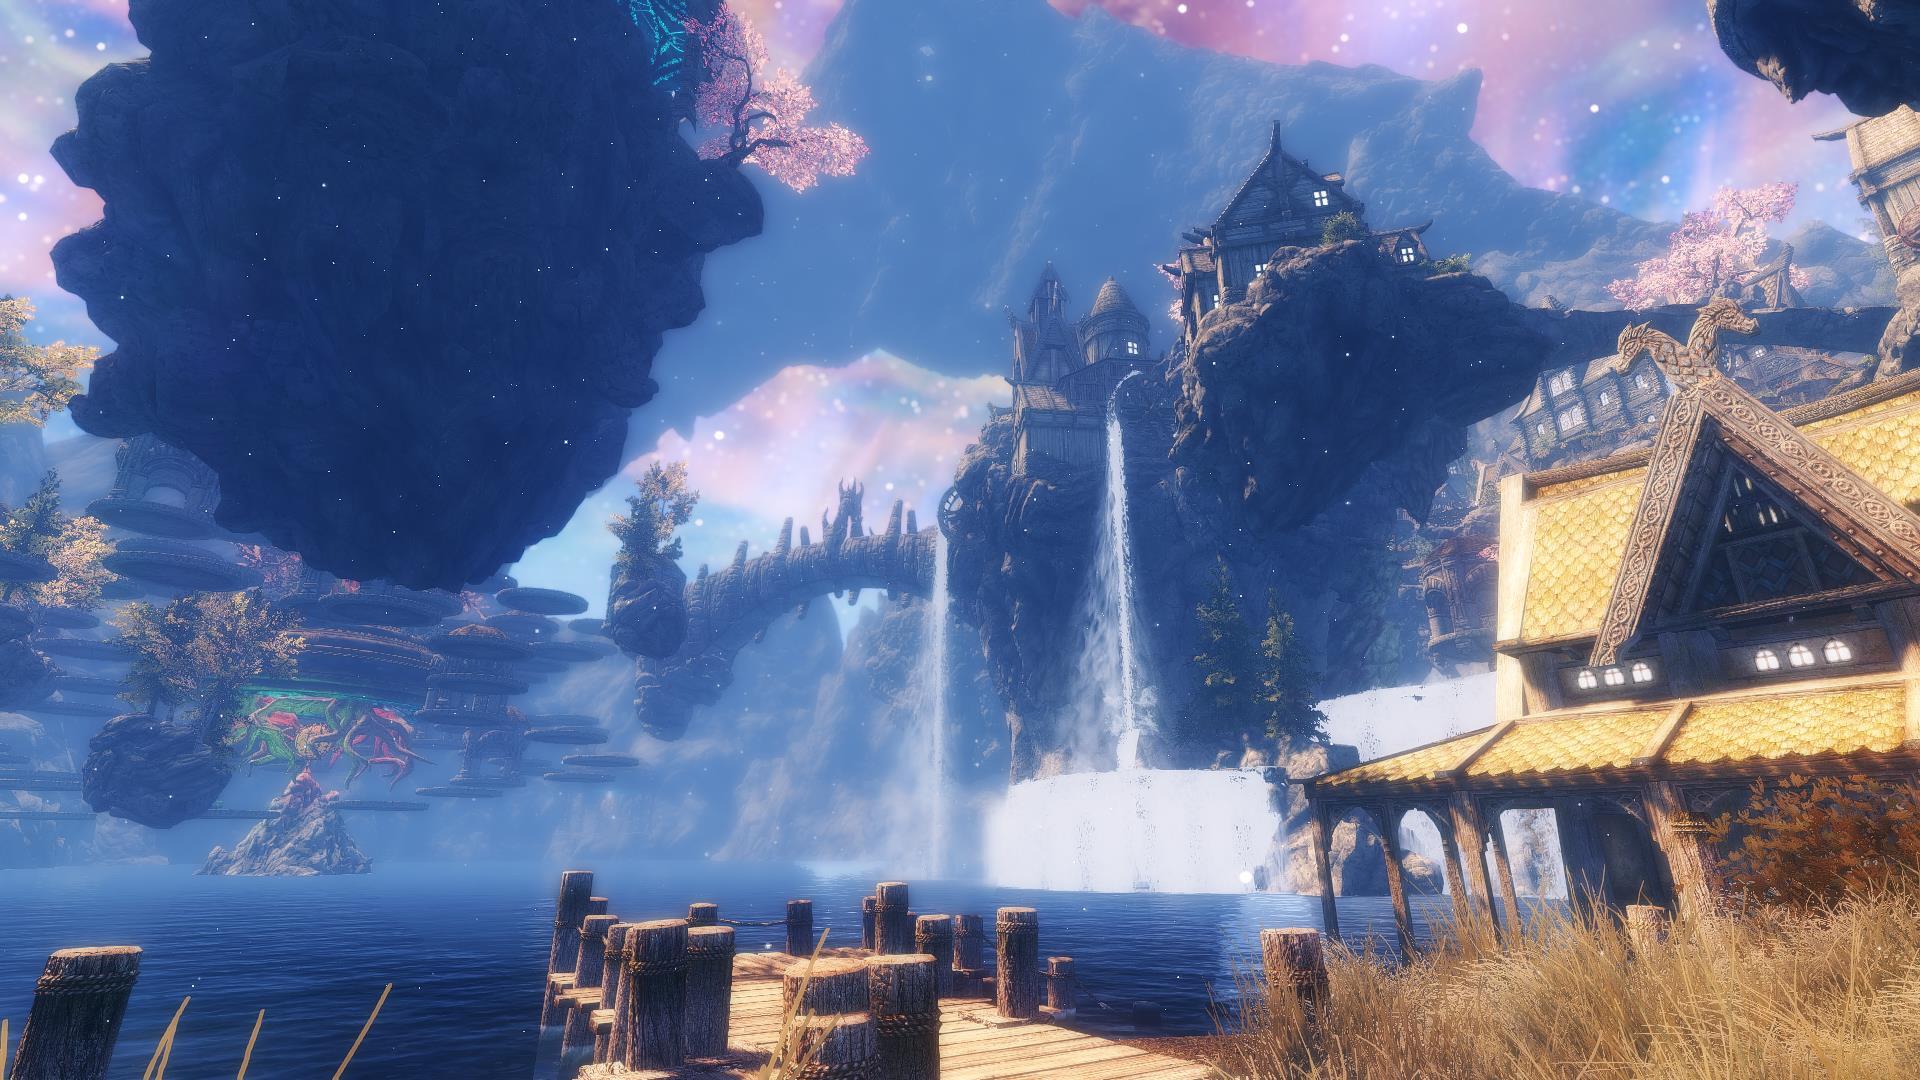 The Dreamborne Isles